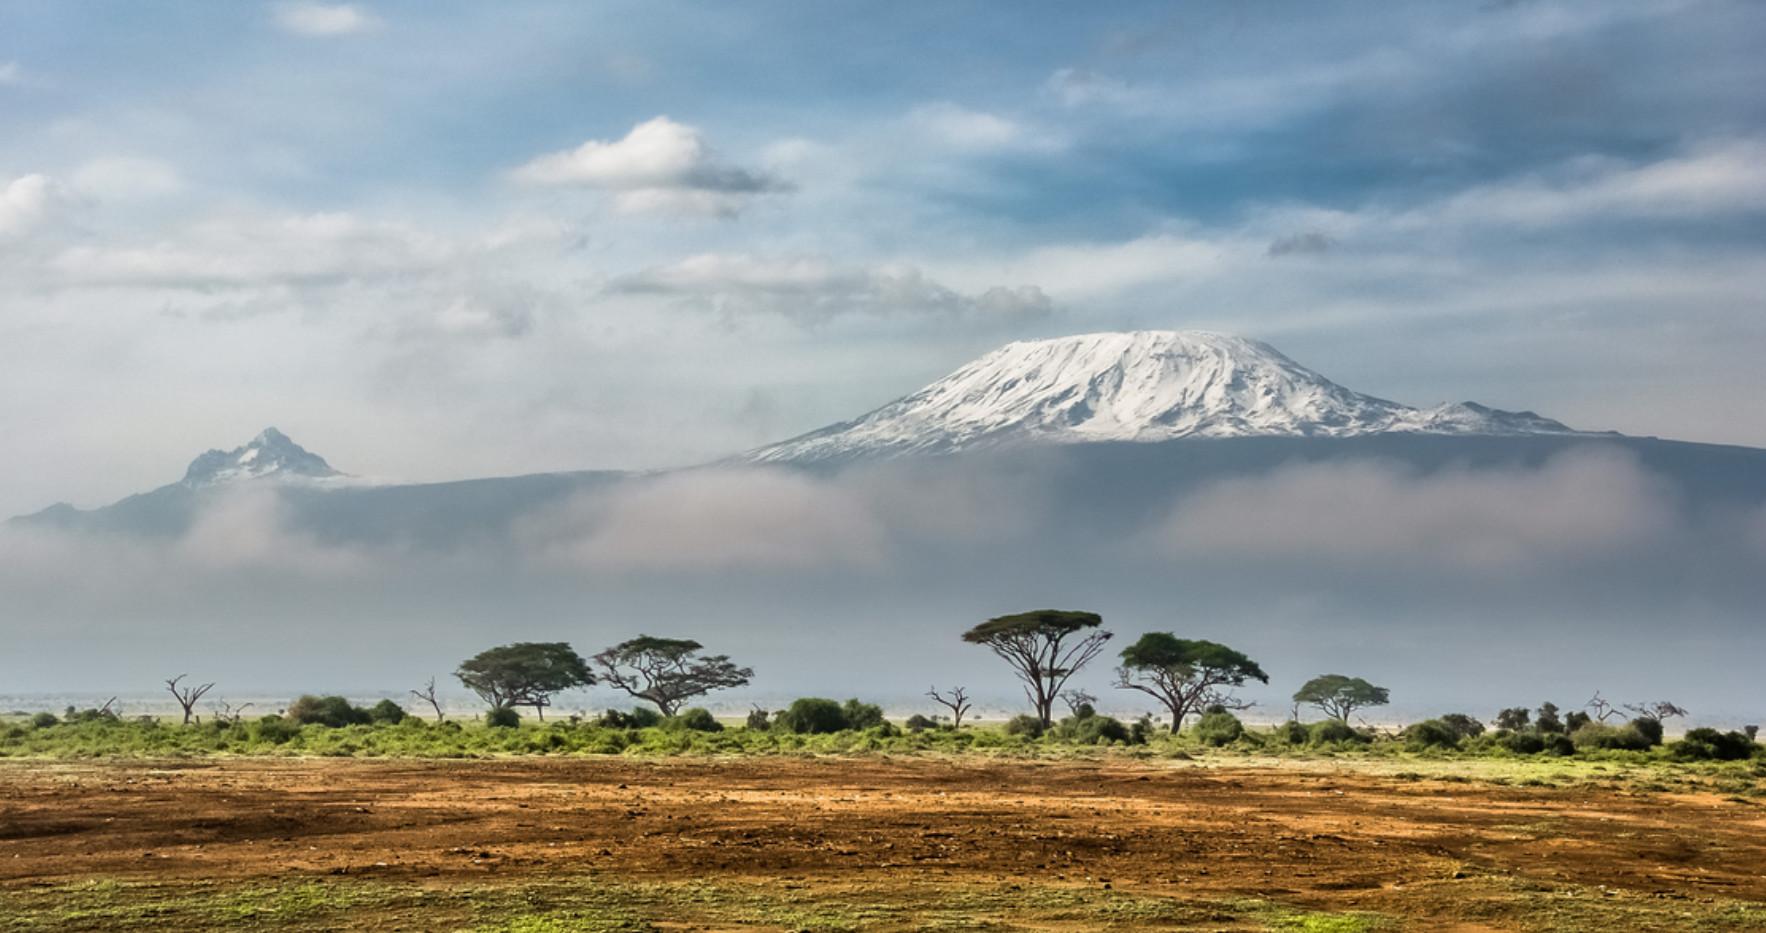 Kilimanjaro from amboseli.jpg